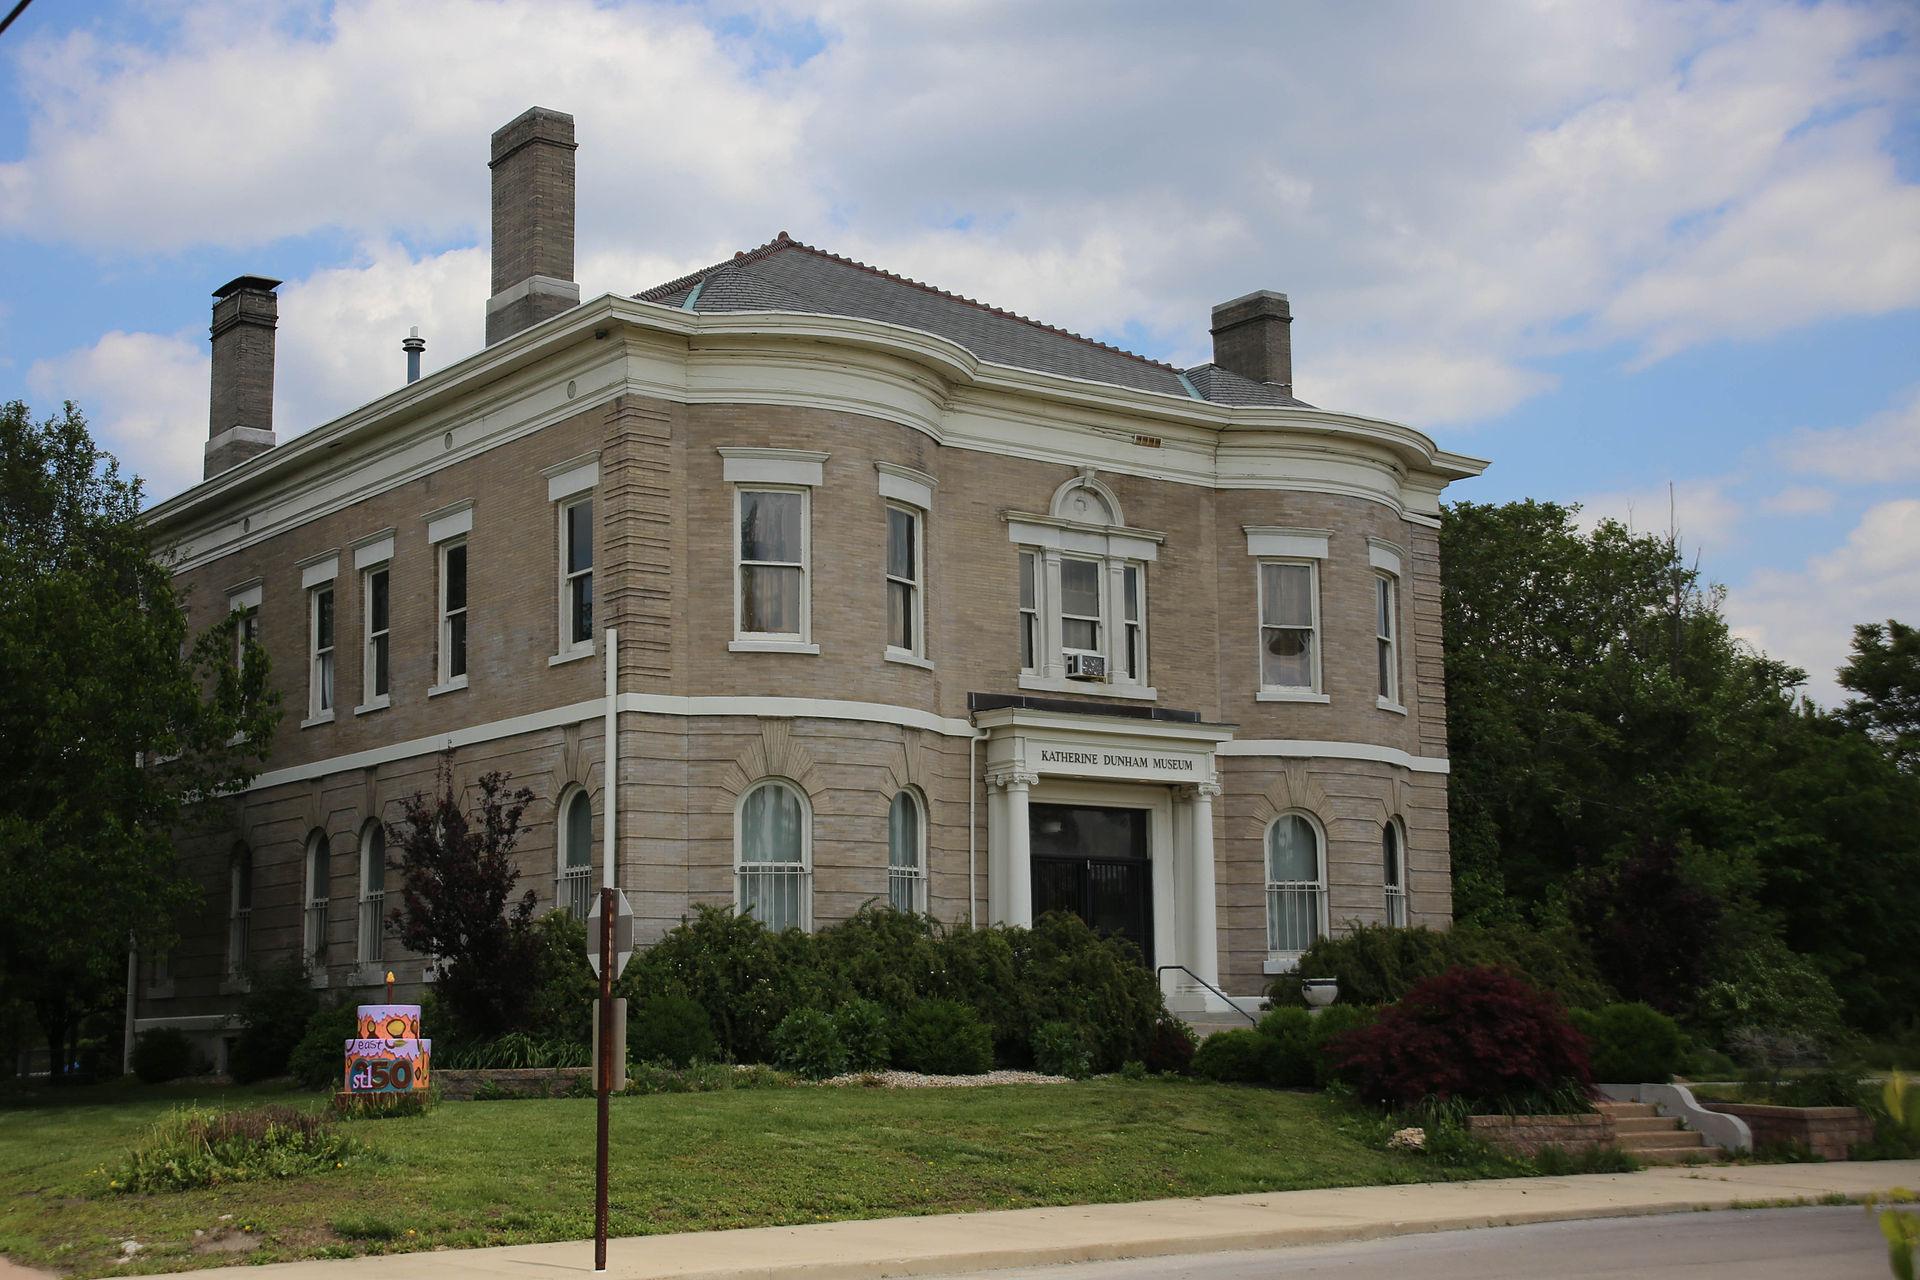 Pennsylvania Avenue Historic District